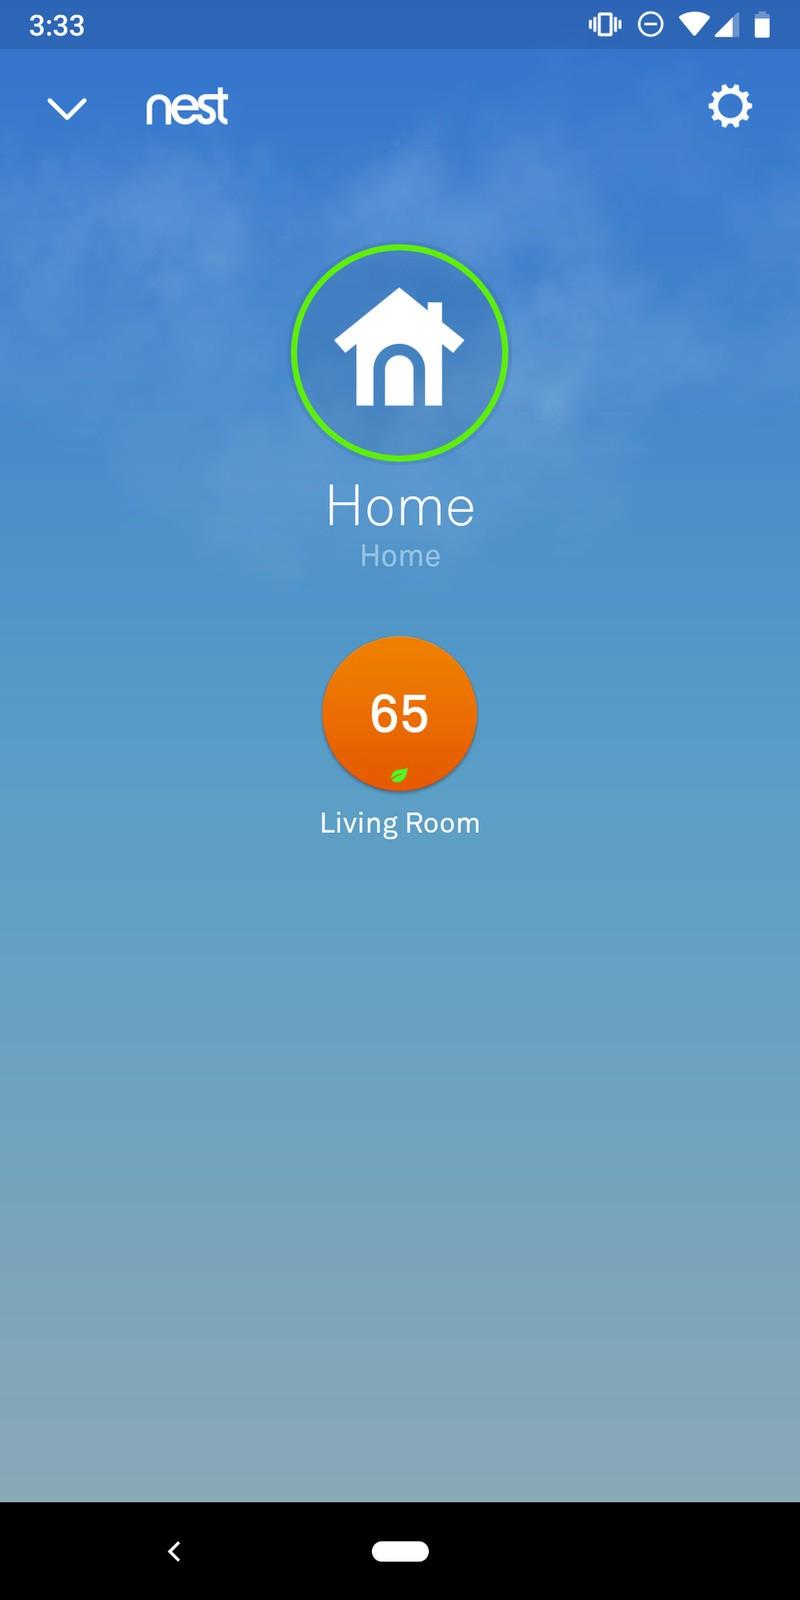 nest-app-change-eco-temps-1.jpg?itok=GWP